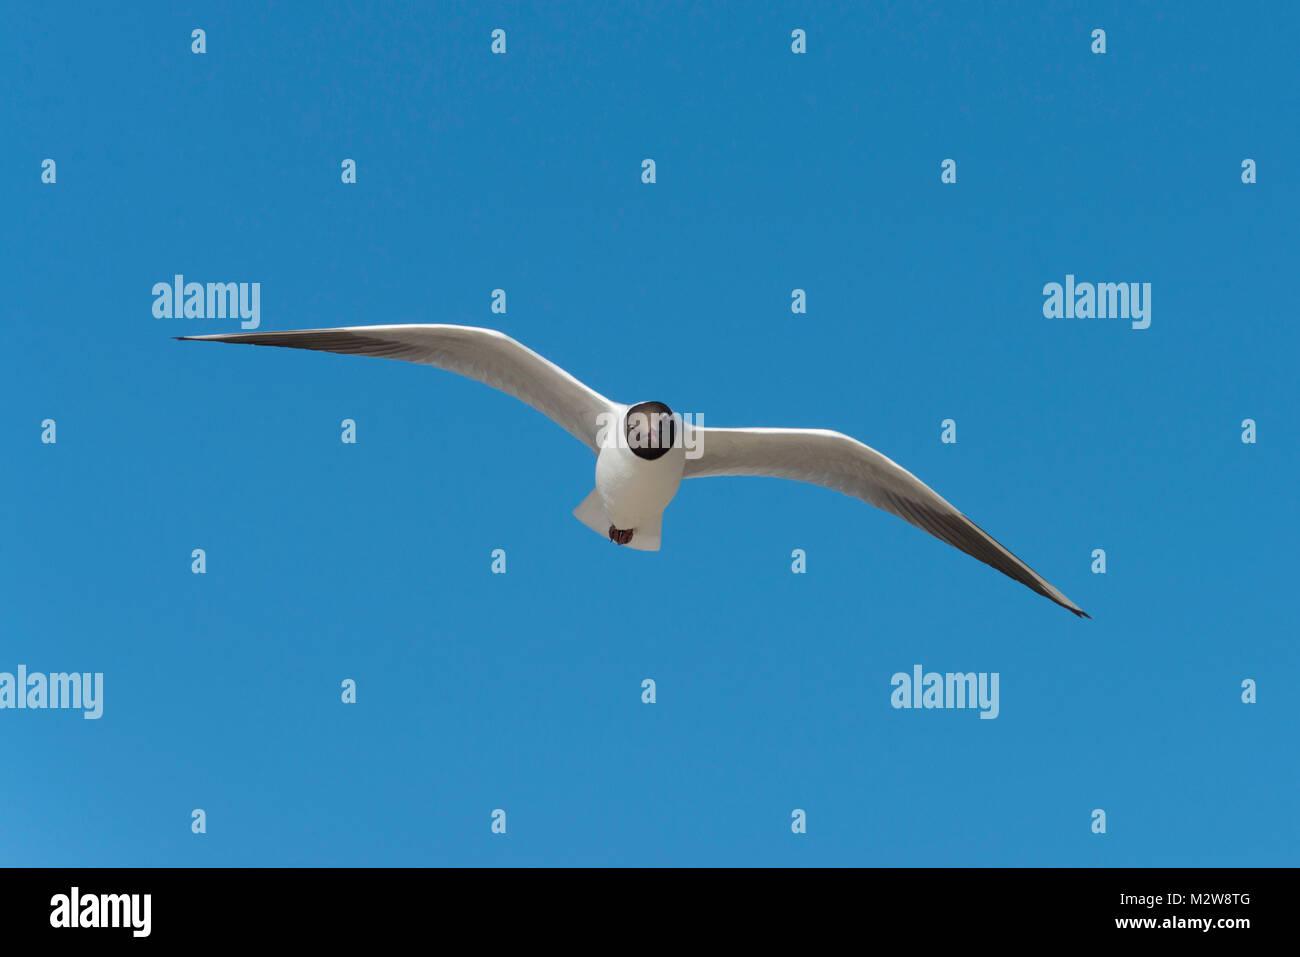 Germany, the North Sea, black-headed gull in the nuptial plumage, black-headed gull (Chroicocephalus ridibundus, - Stock Image